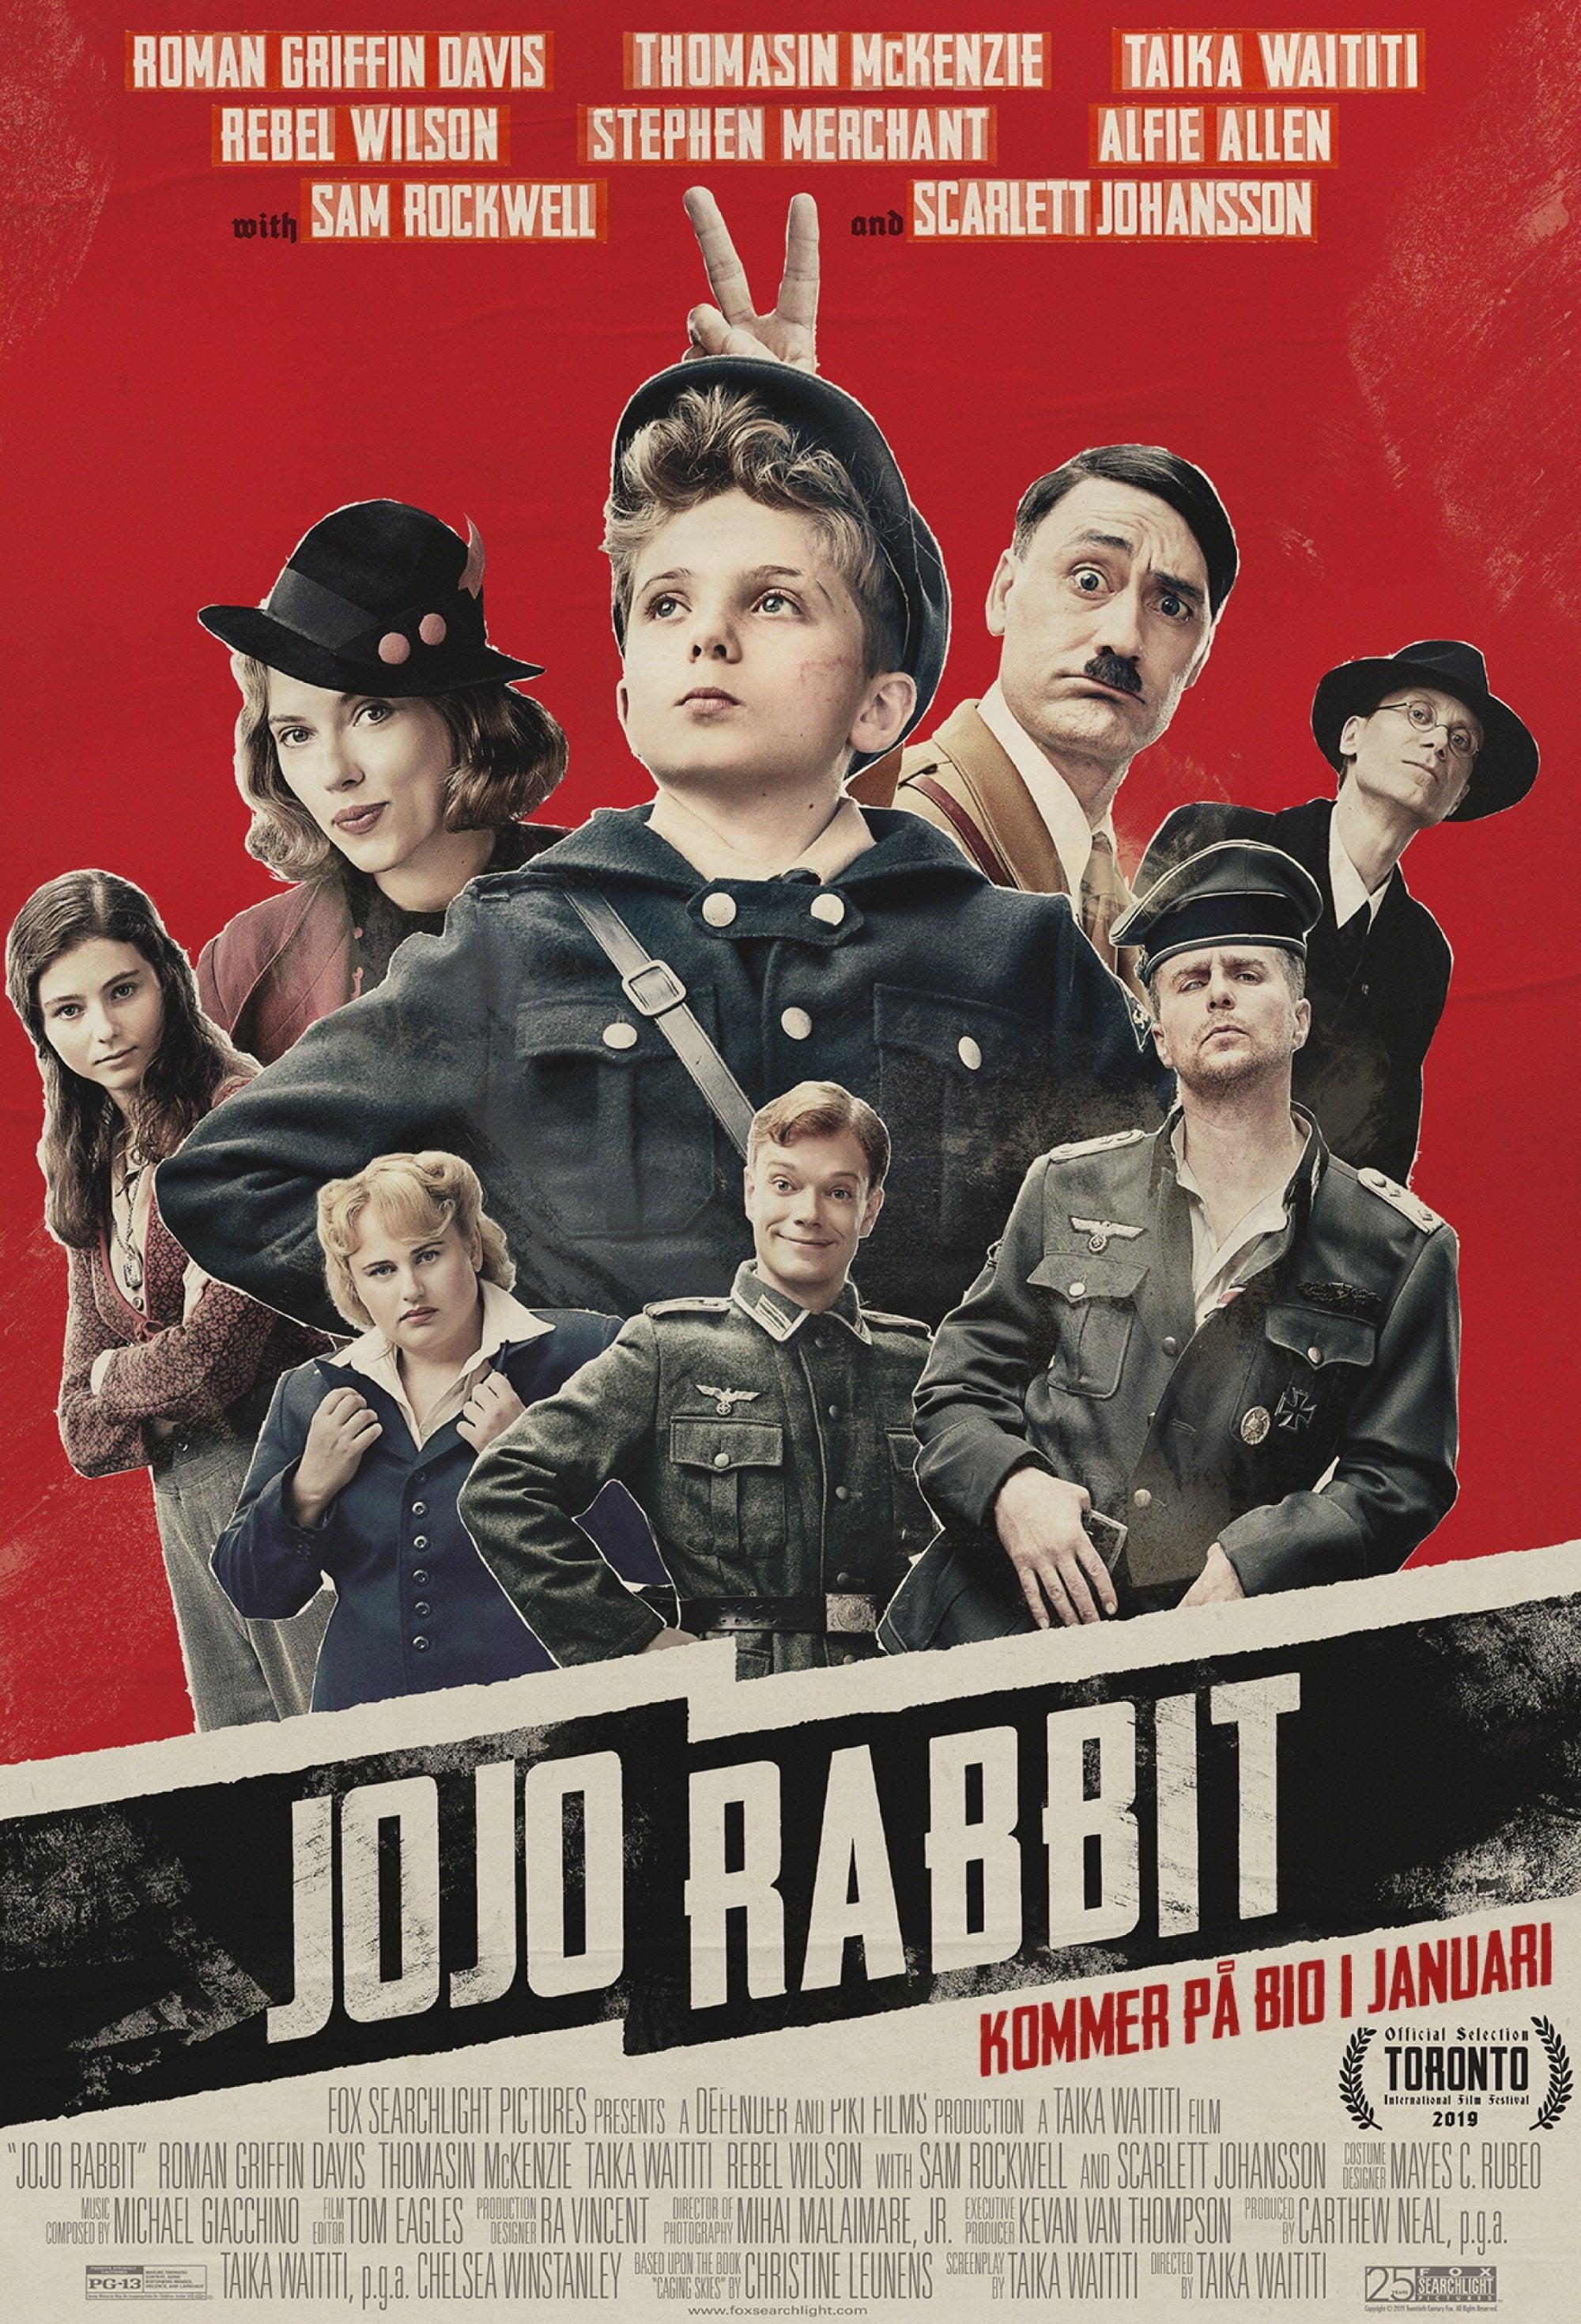 Poster and image movie Film Jojo Rabbit 2019